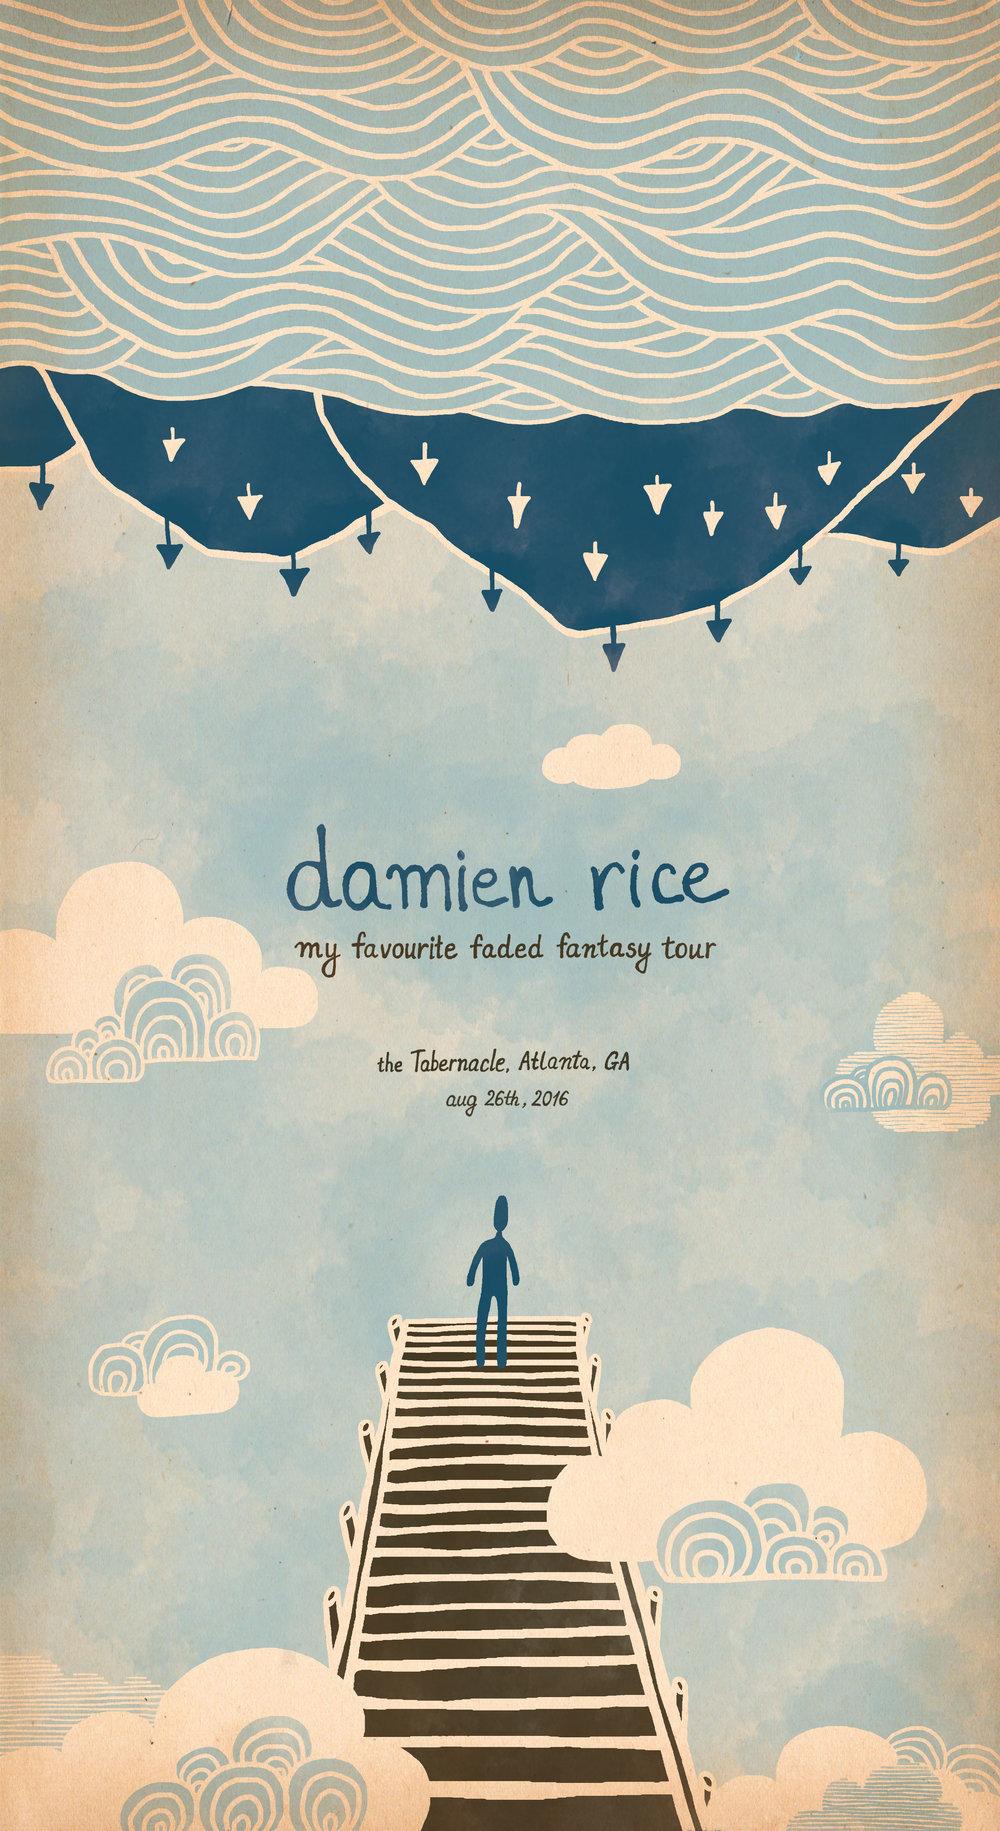 Damien Rice Concert Tour Poster